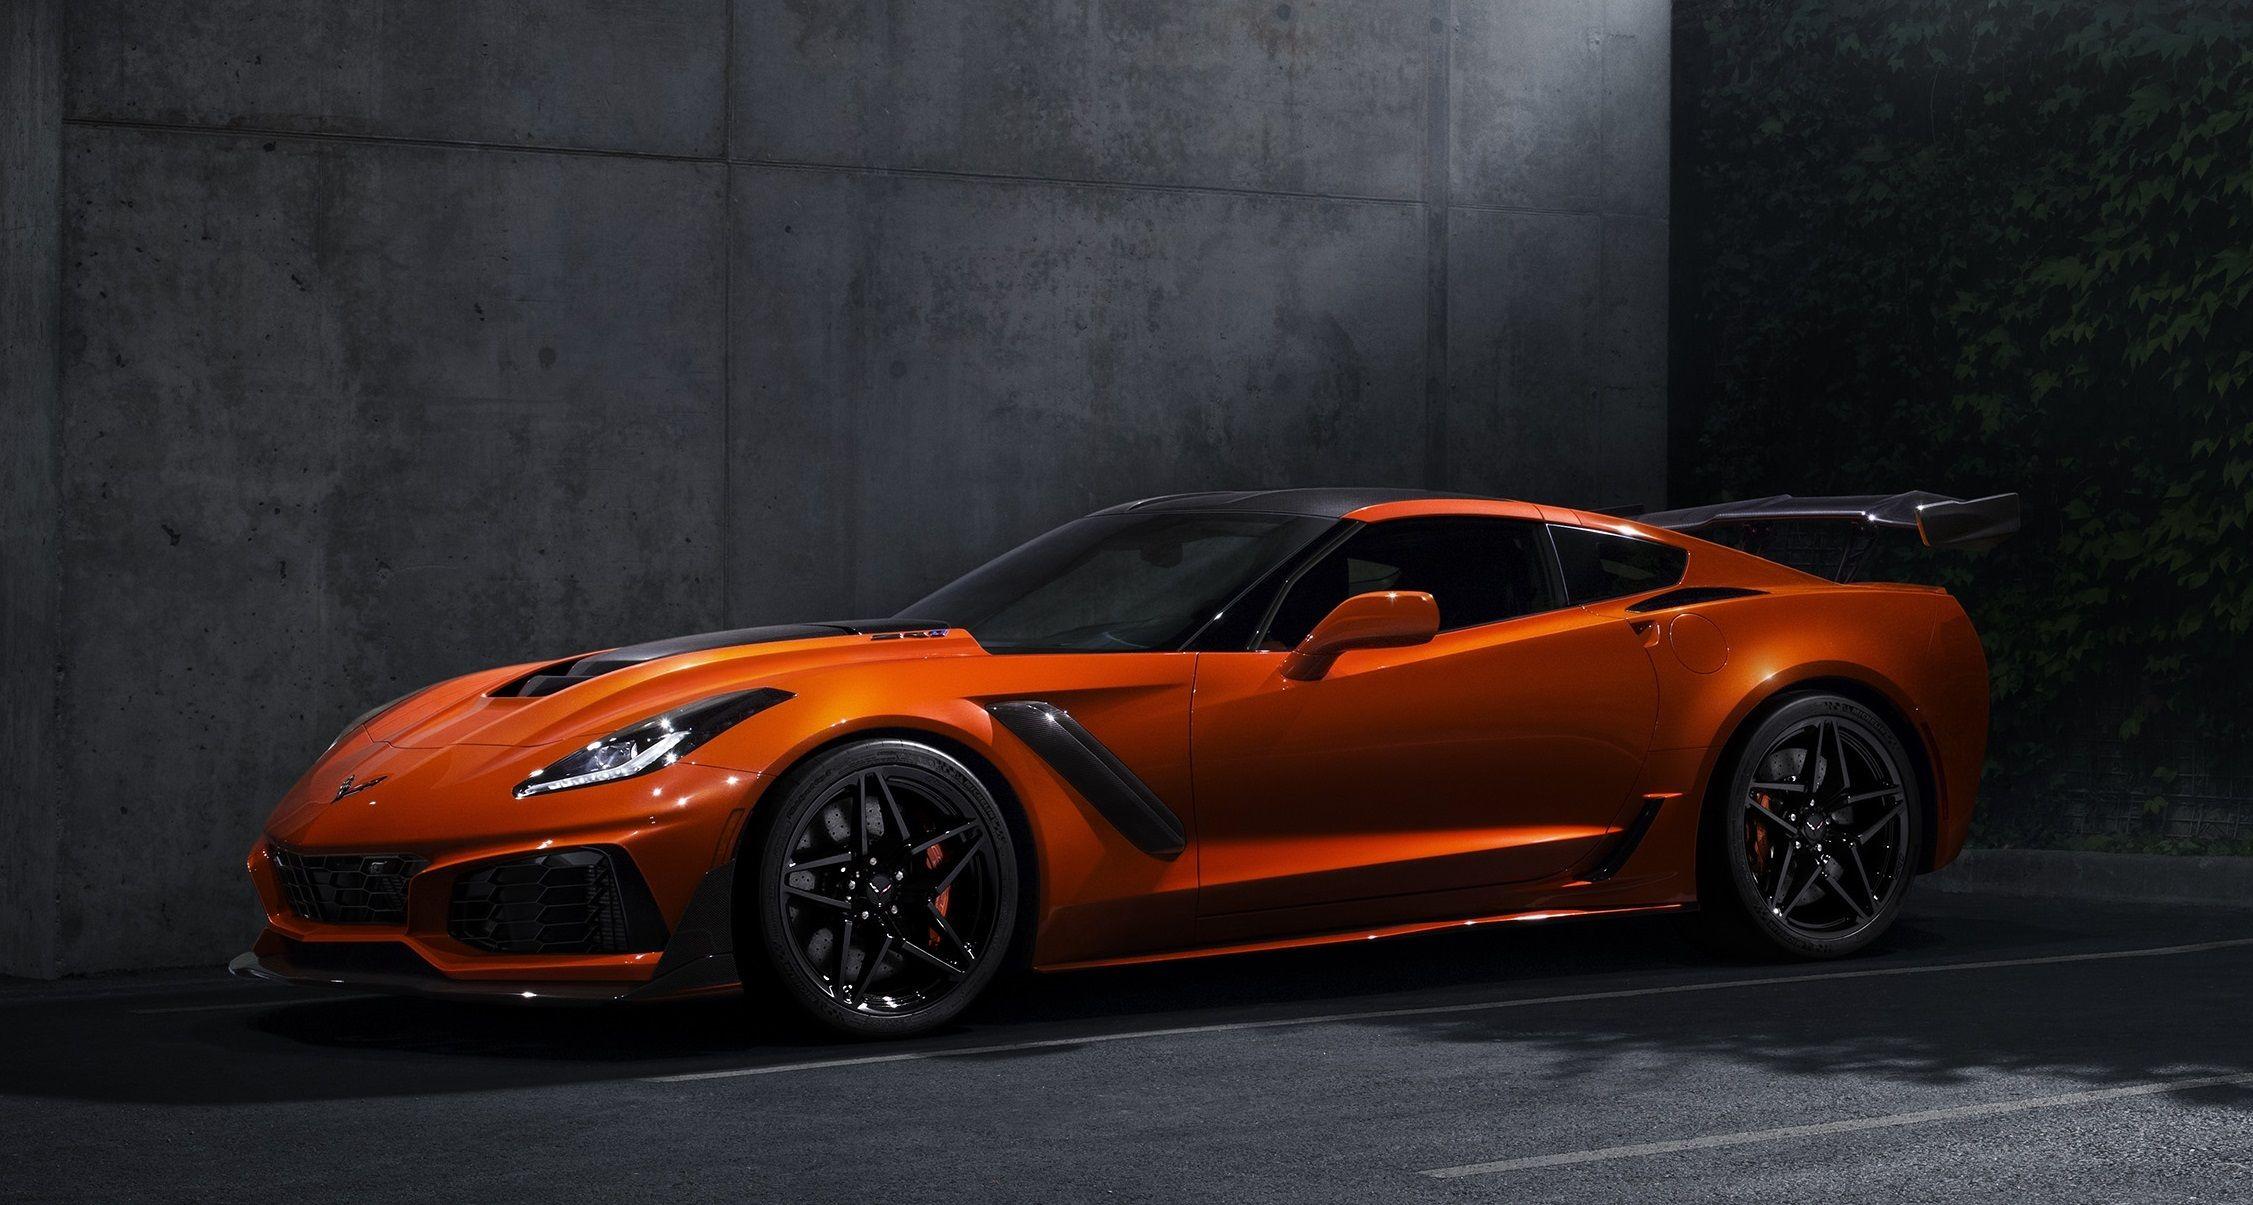 2019 Chevrolet Corvette Zr1 Will Ragna Rock Your World With Images Corvette Zr1 Chevy Corvette Chevrolet Corvette